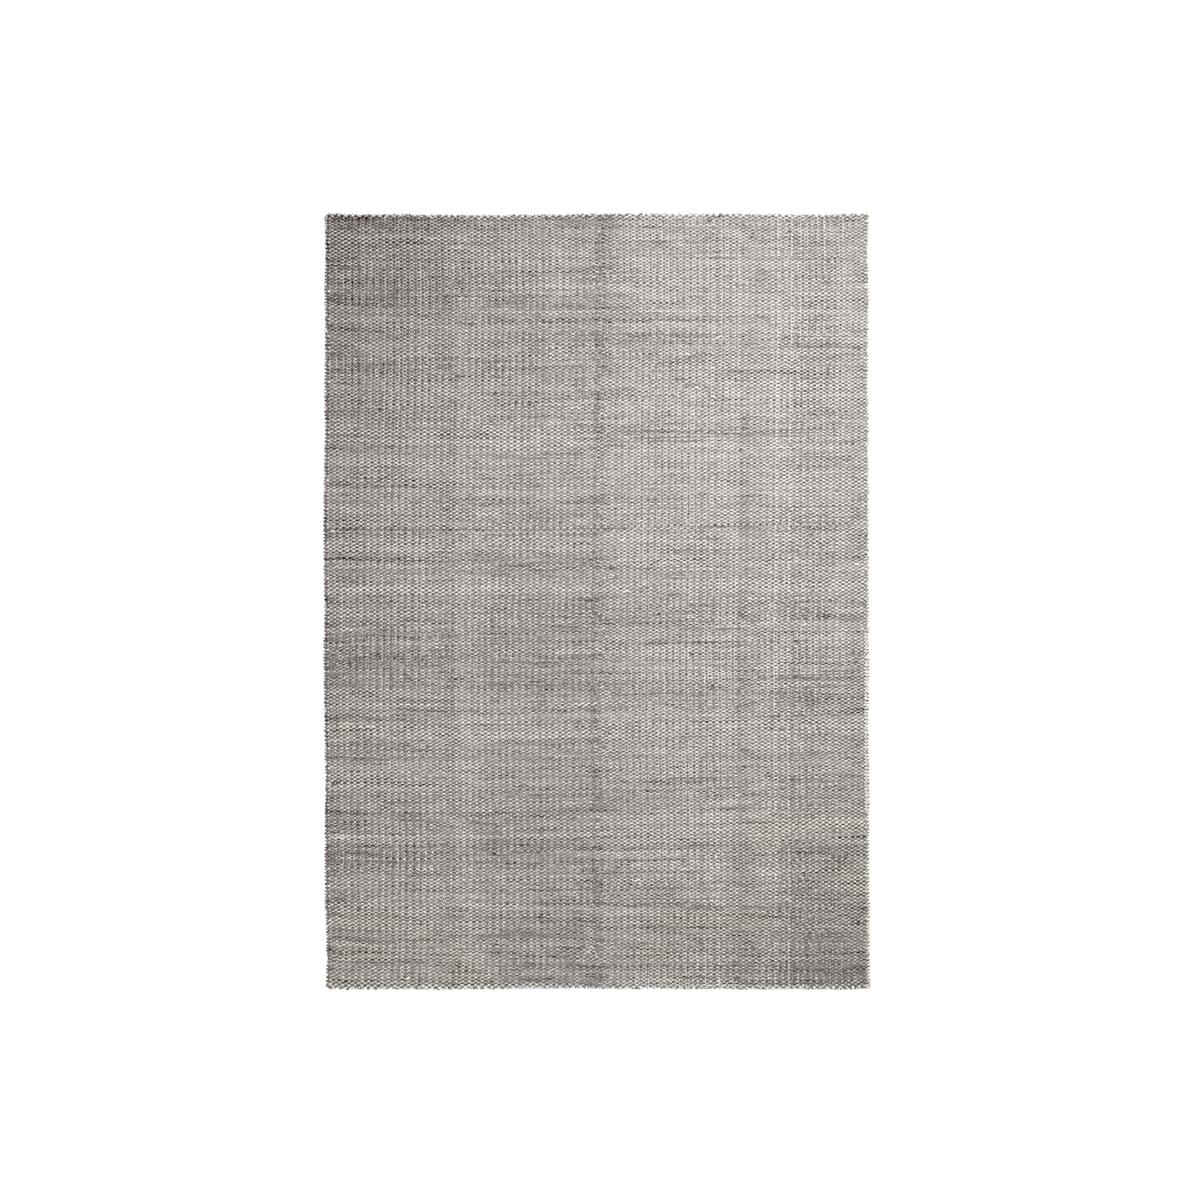 Hay Teppich moiré kilim rug by hay connox